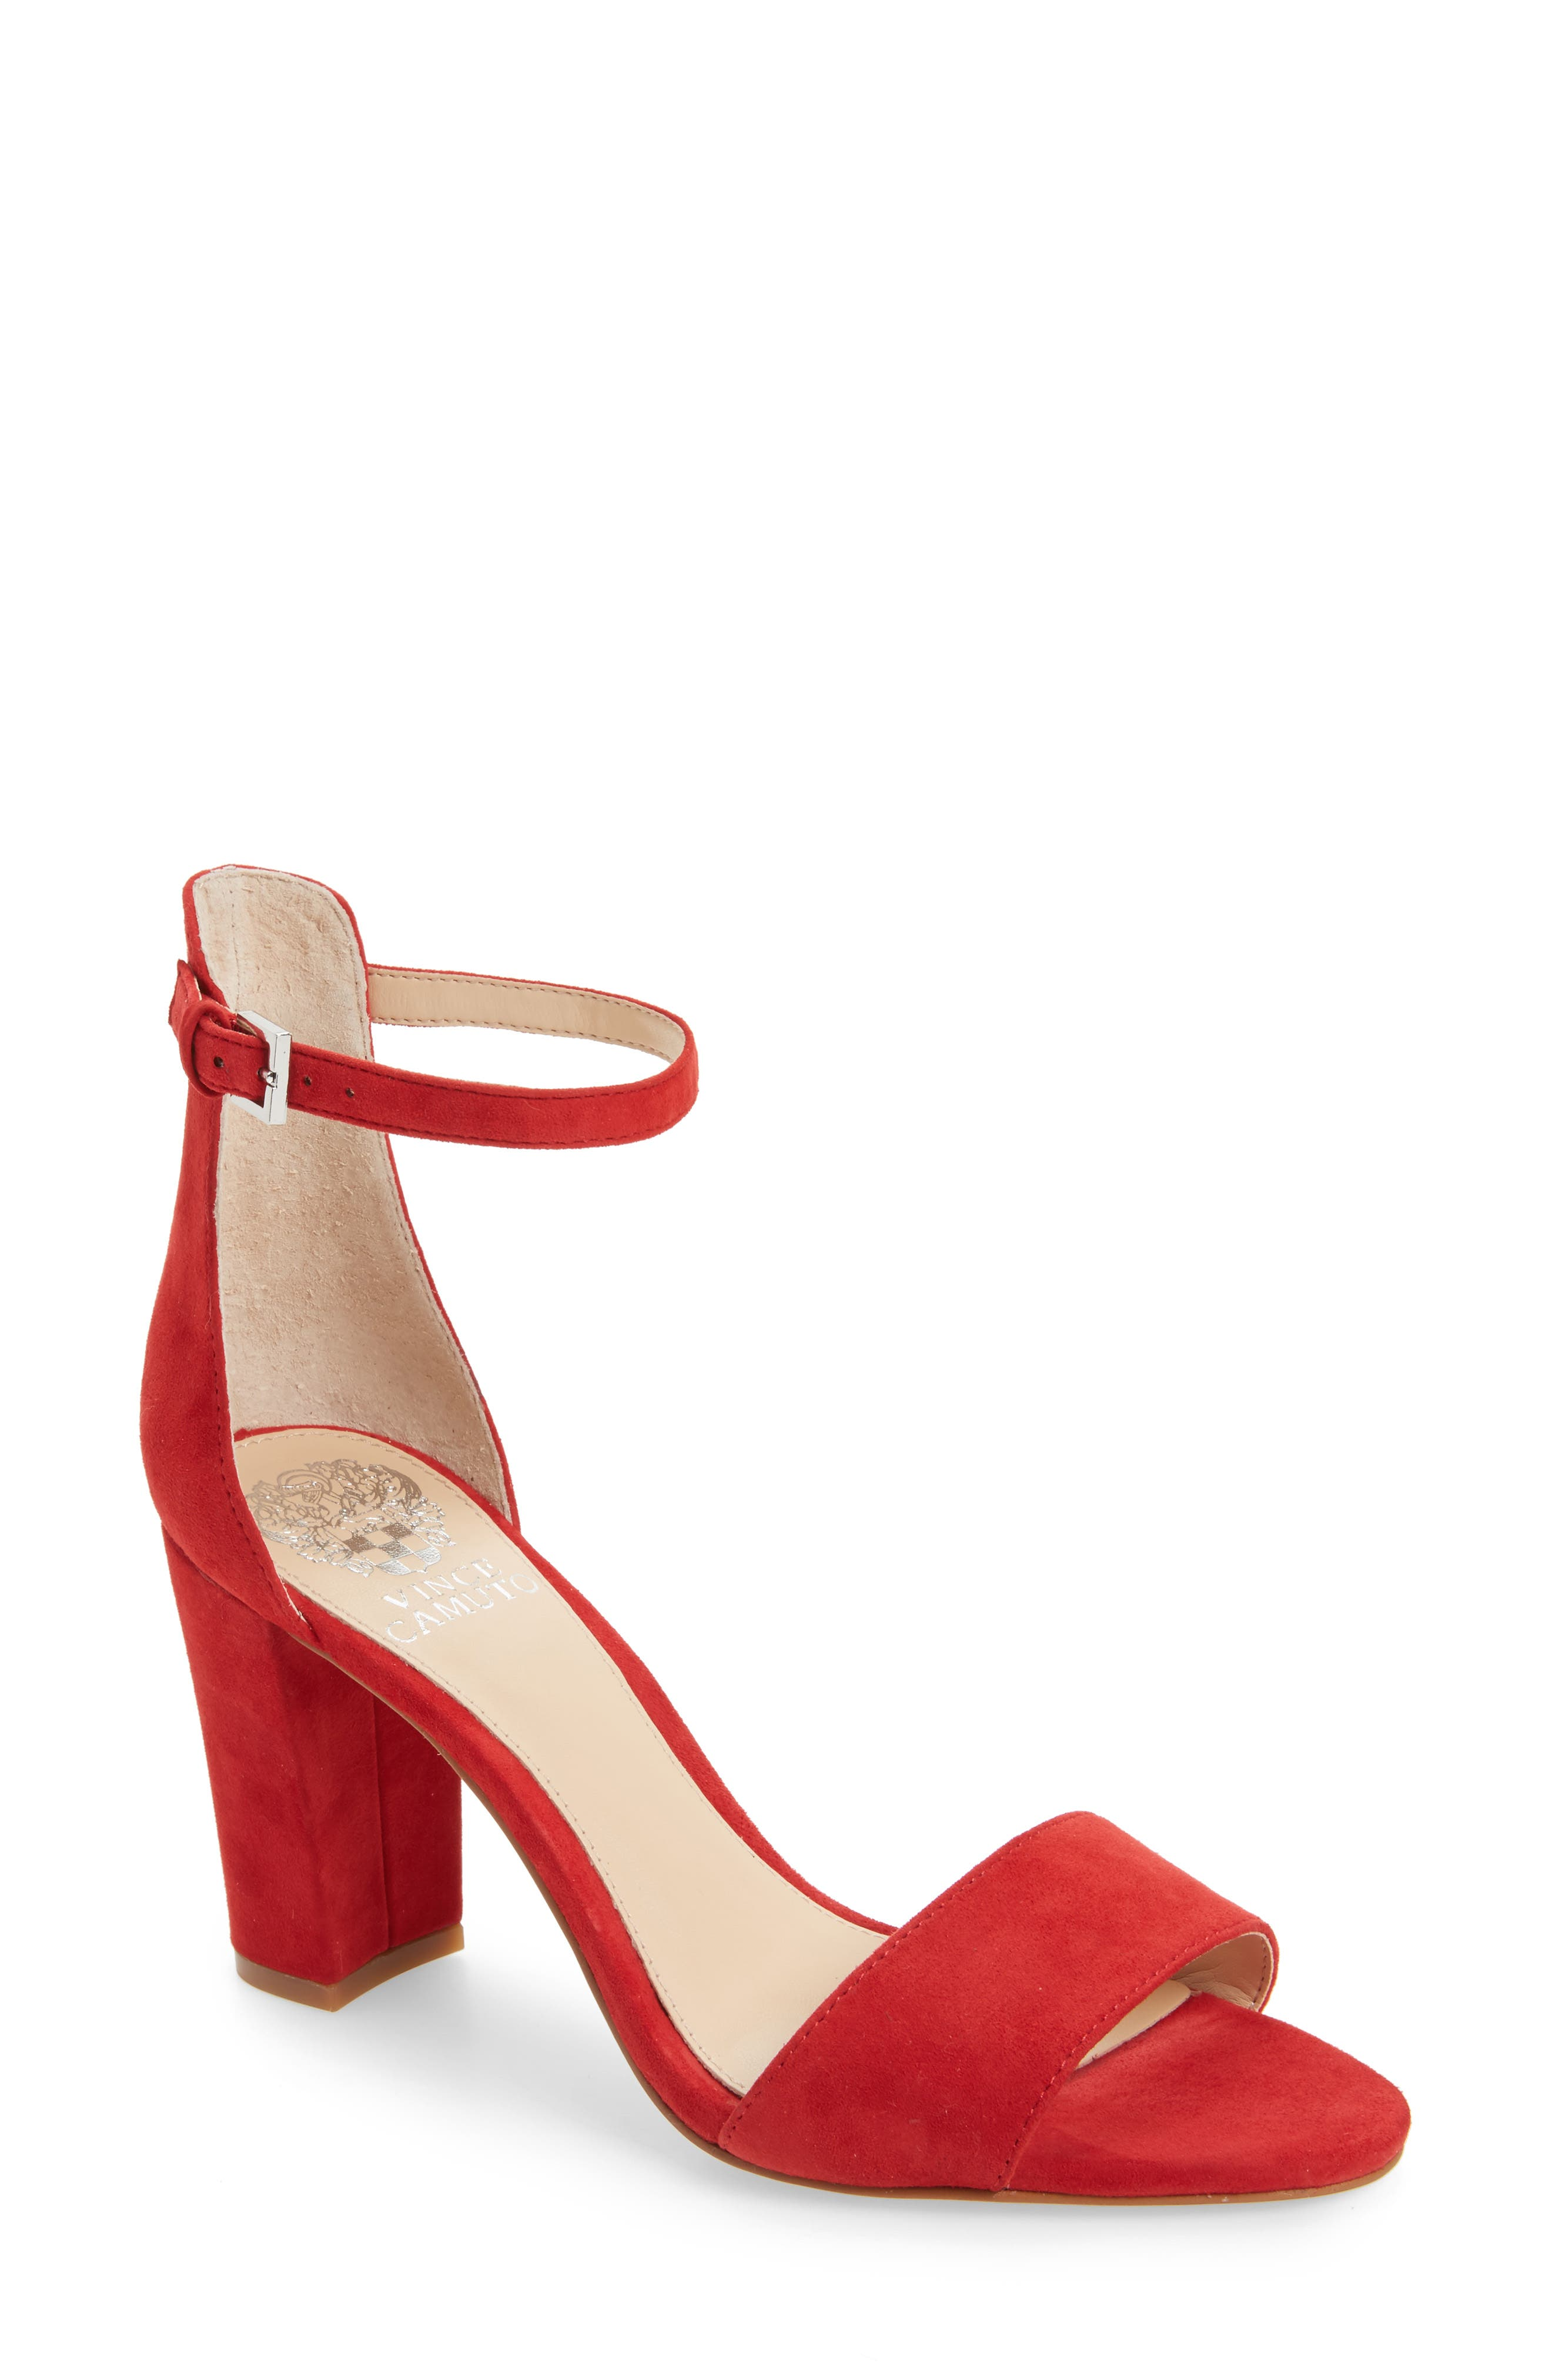 Red Shoes High Heels ssOOUFIi